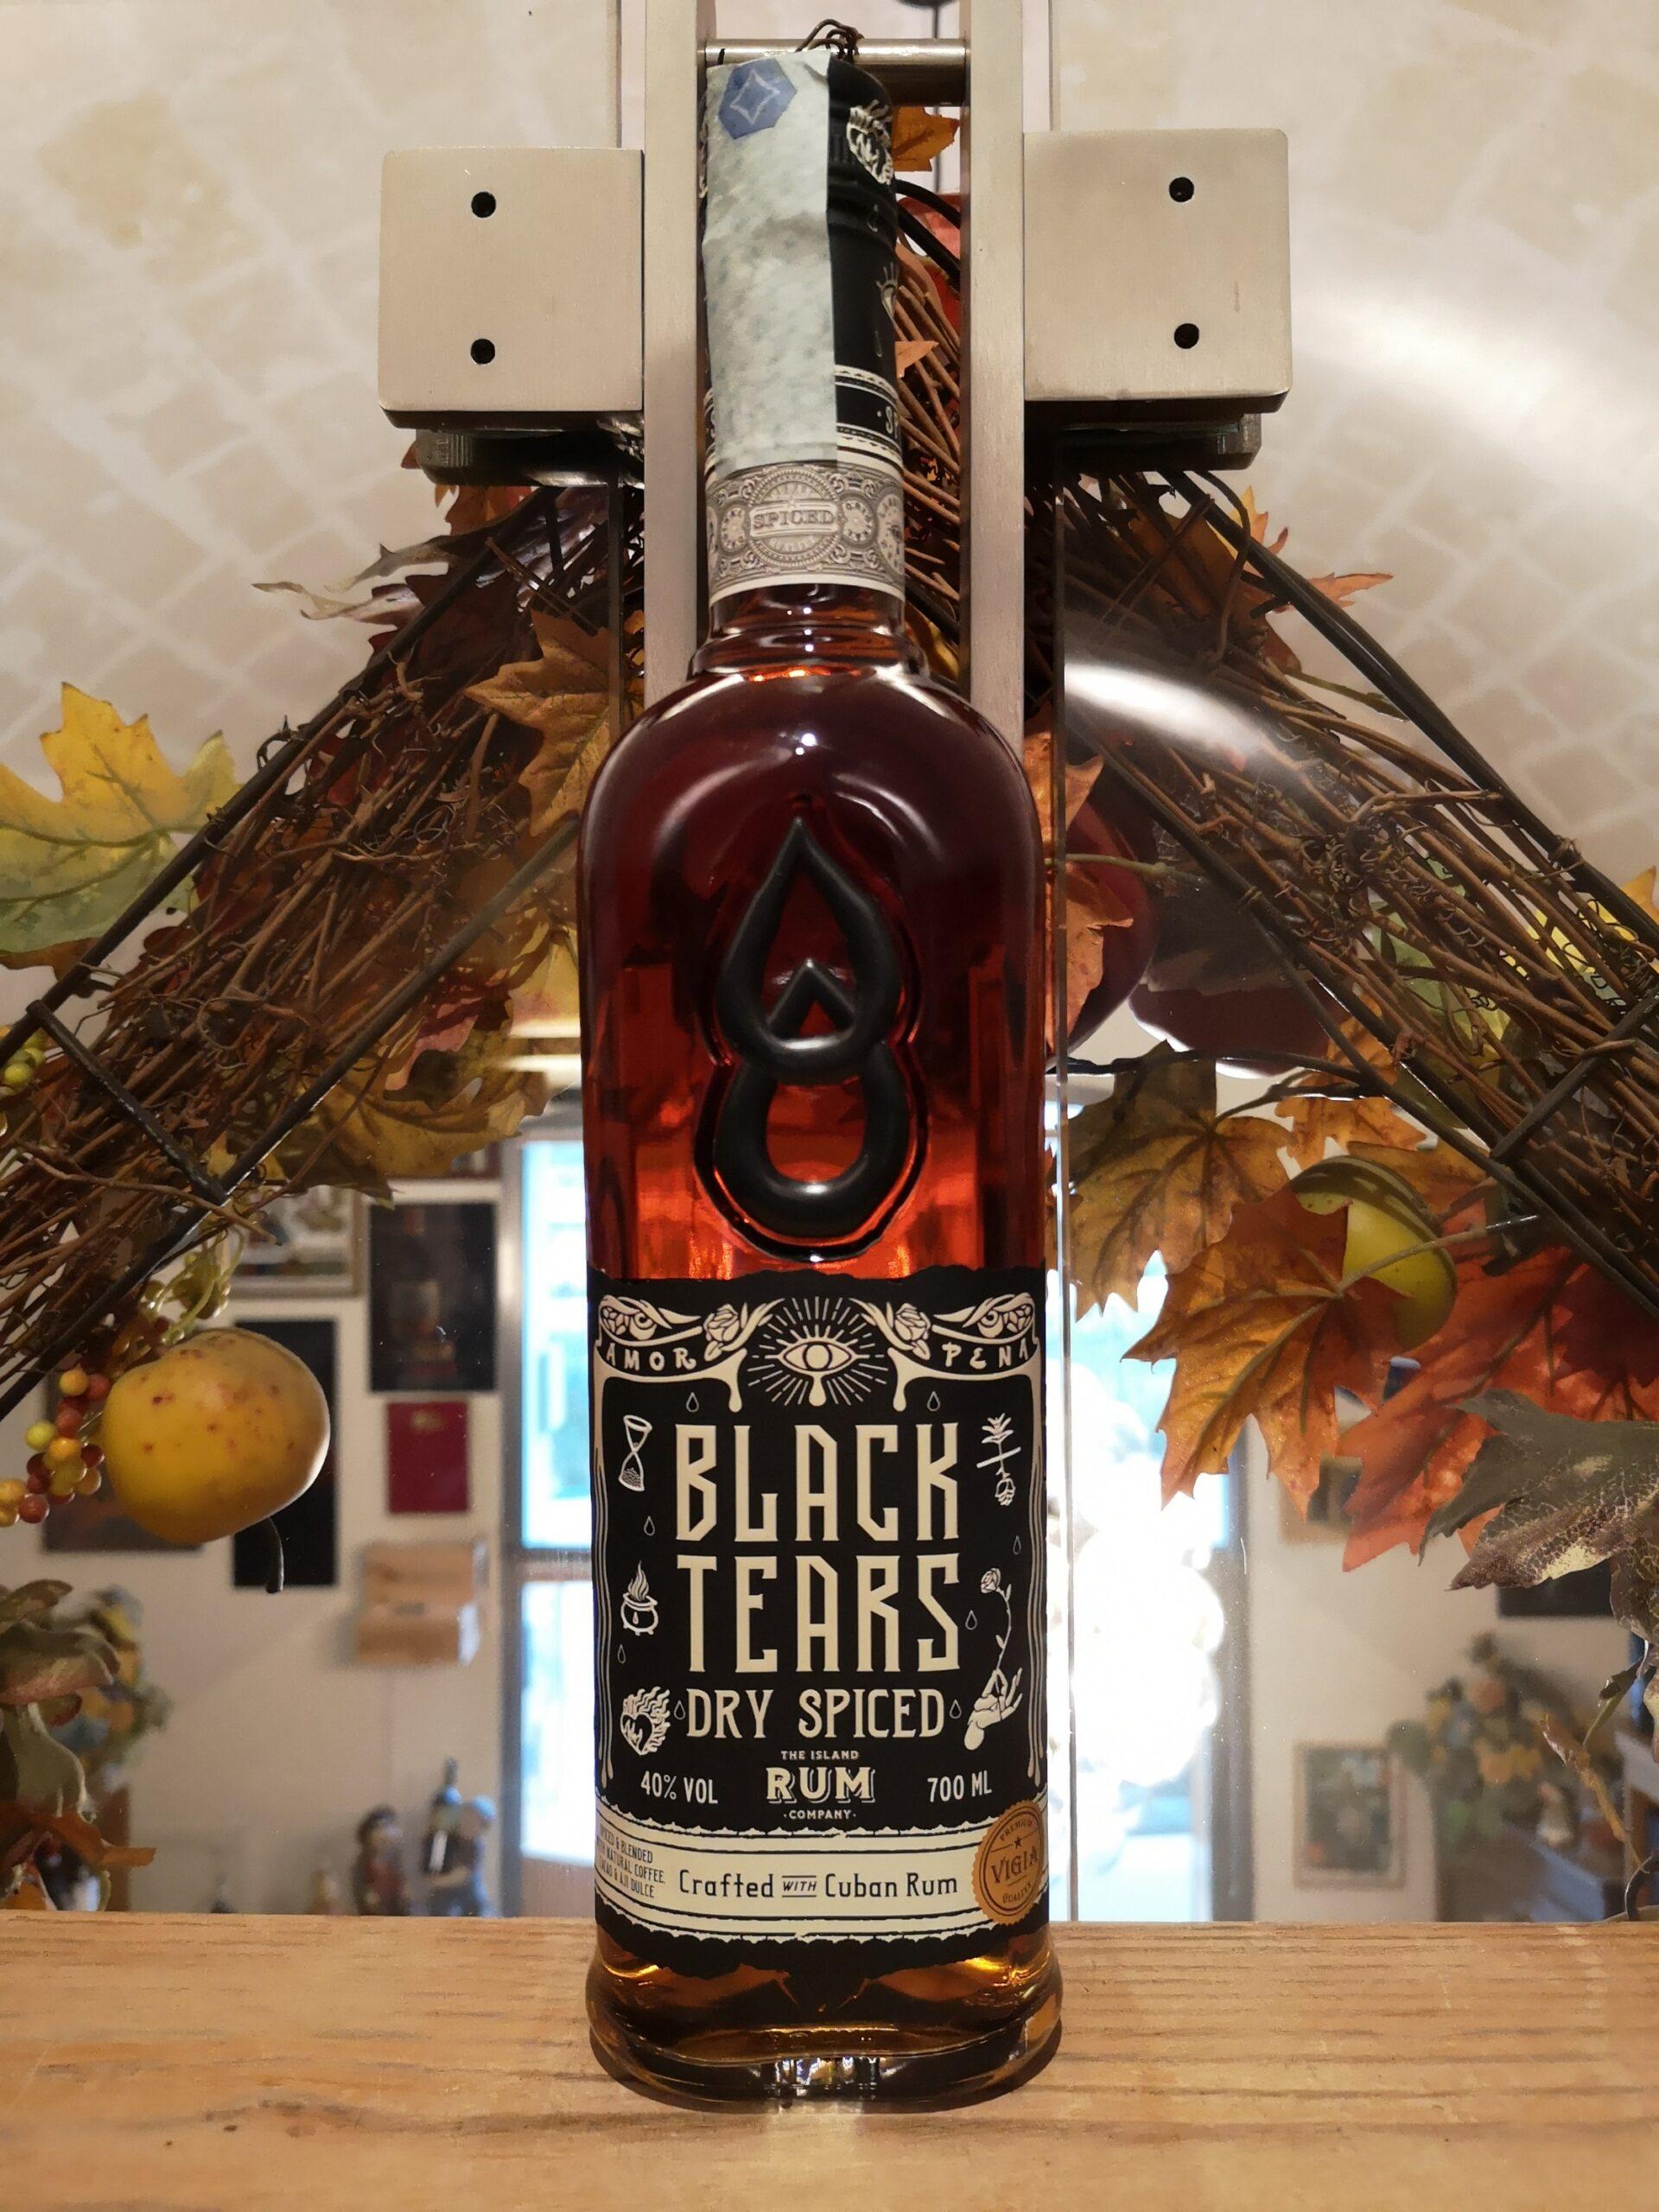 Black Tears Dry Spiced Rum